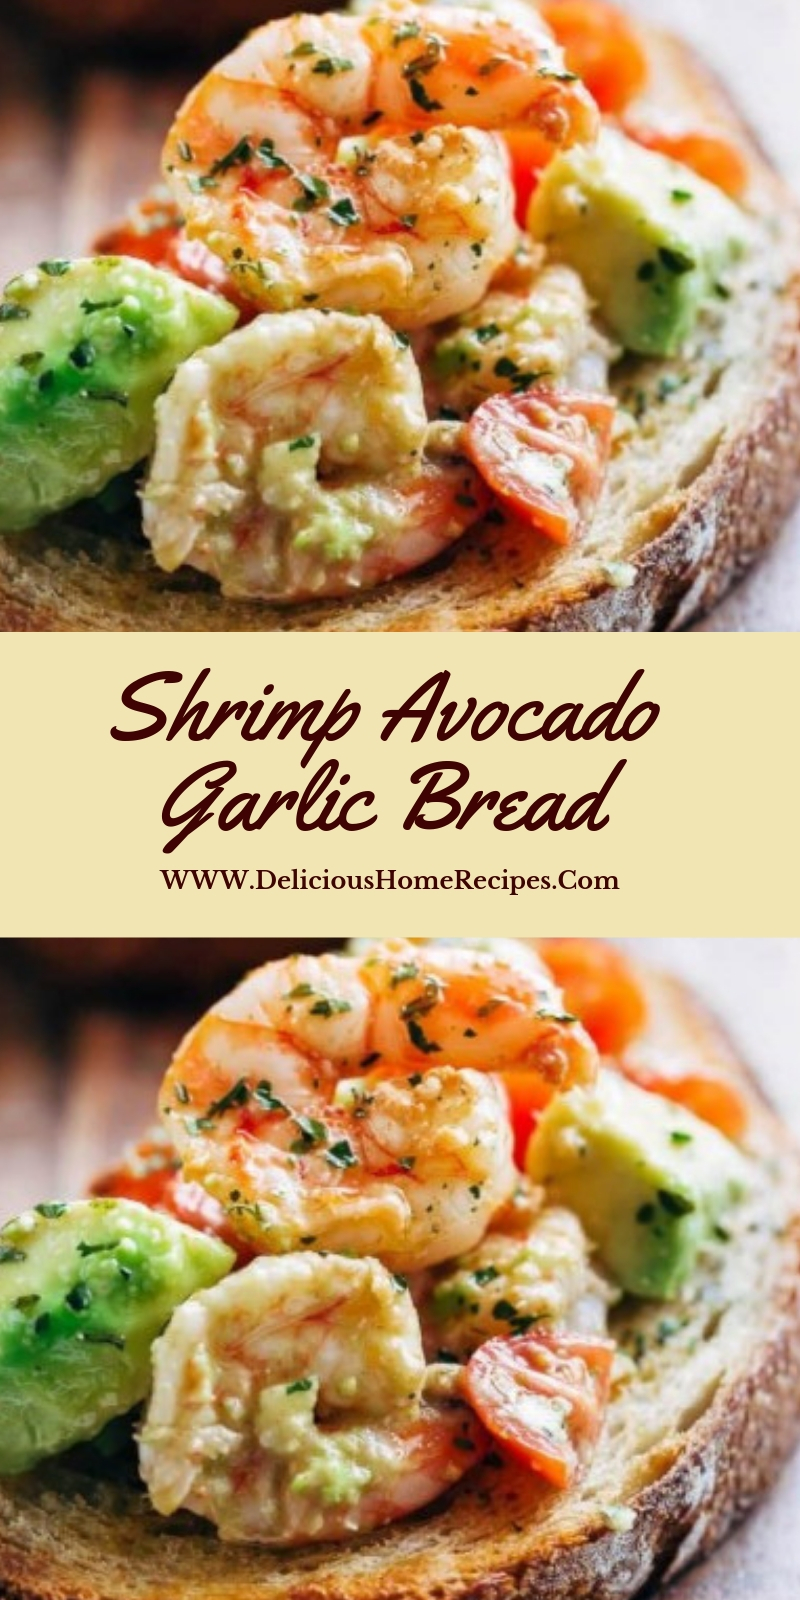 Shrimp Avocado Garlic Bread #christmas #lunch